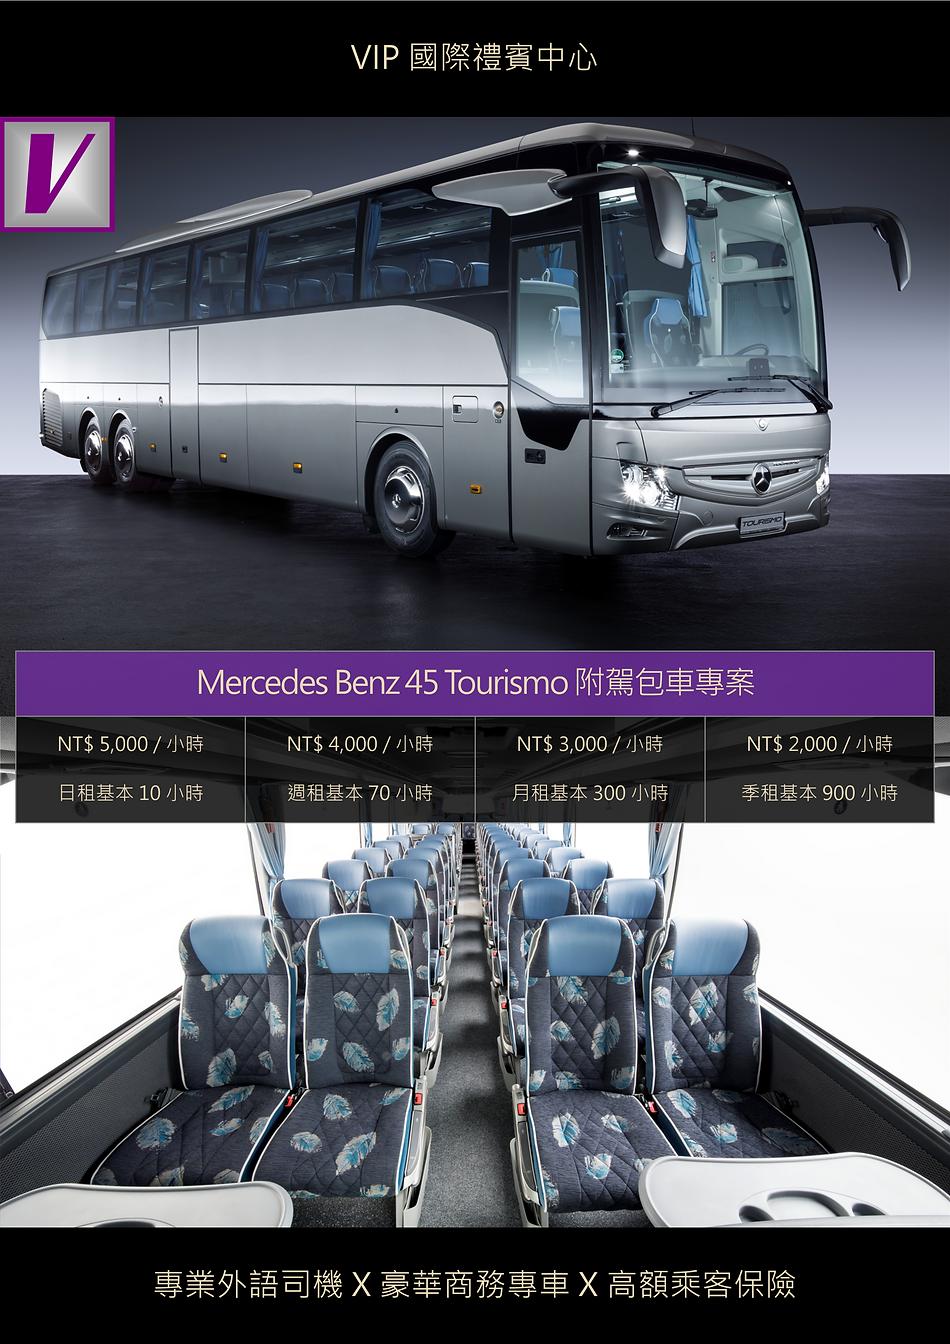 VIP國際禮賓中心 MERCEDES BENZ 45 TOURISMO 附駕包車專案 DM.png